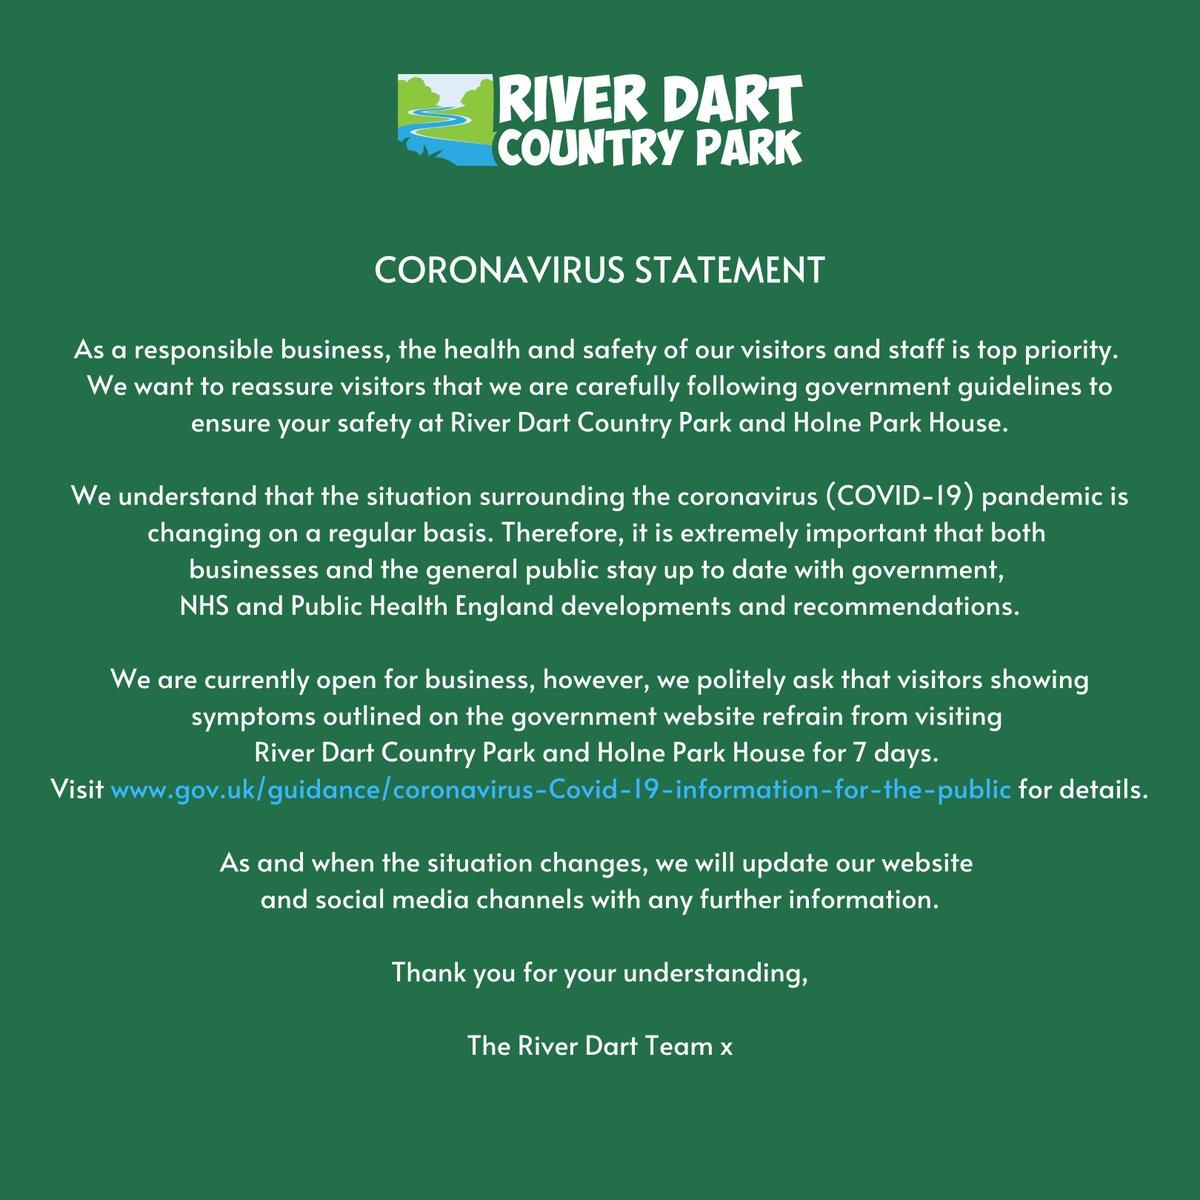 **UPDATE: Please read through our coronavirus statement below**